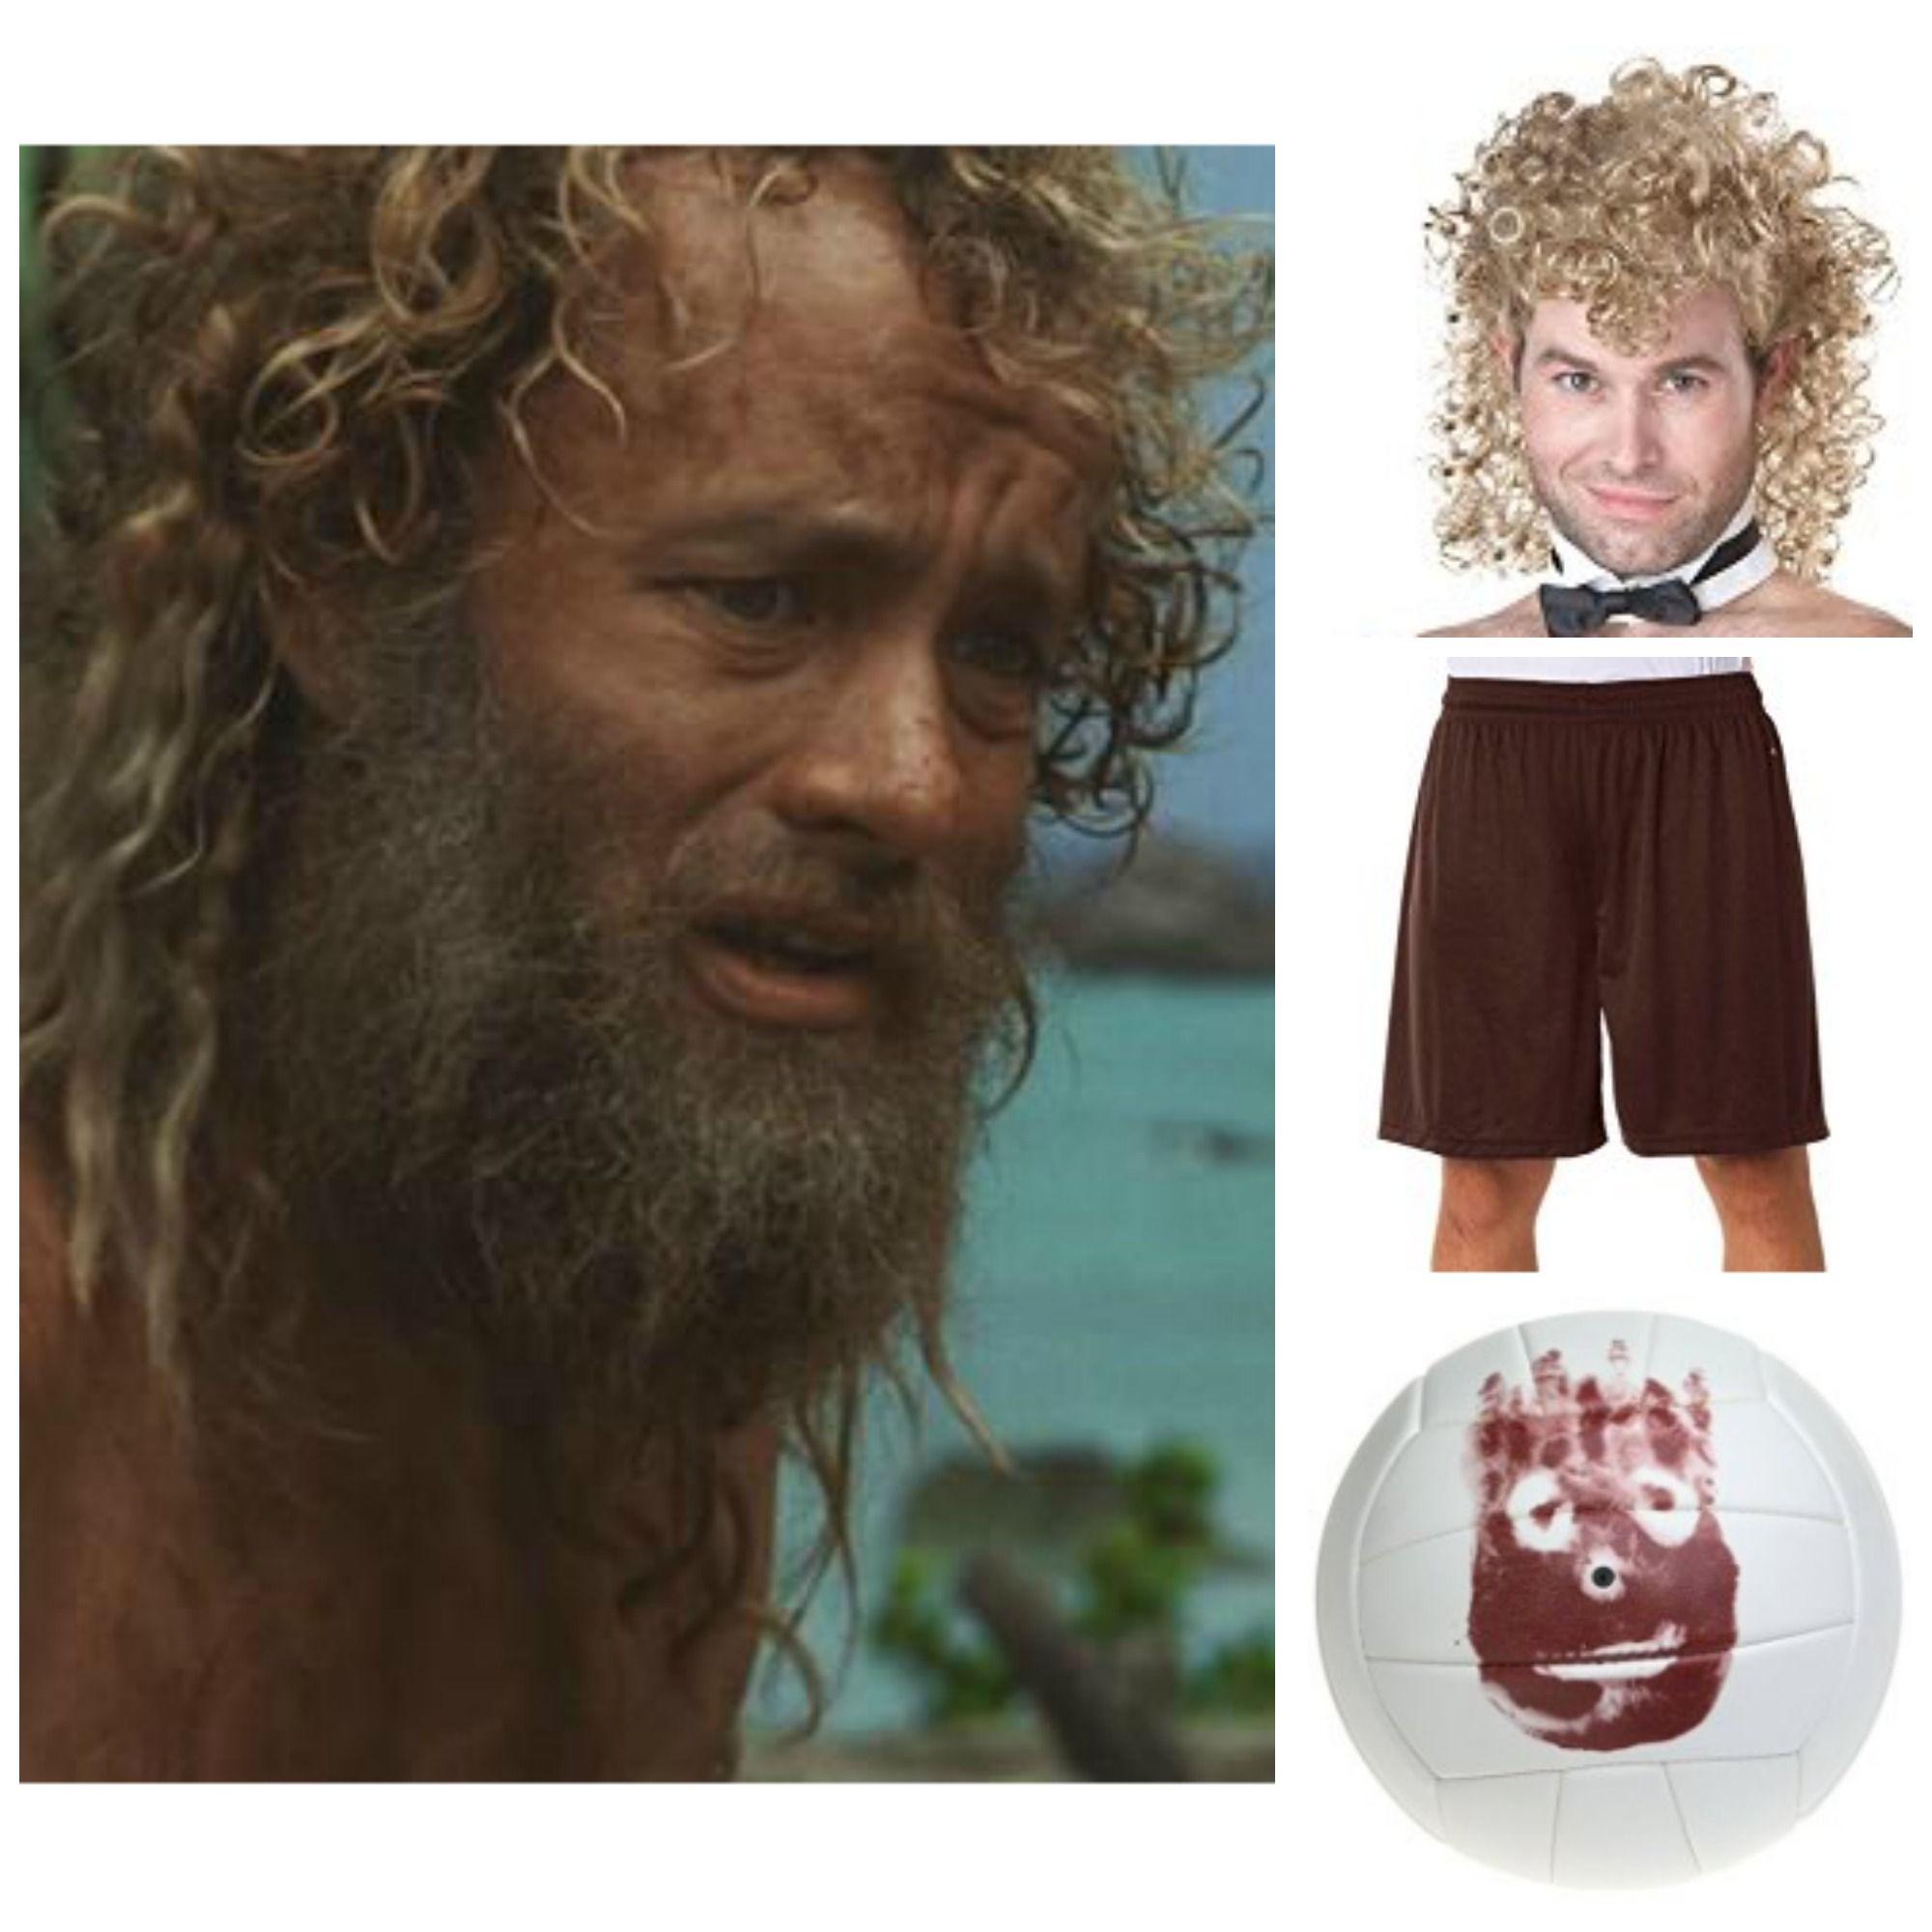 Castaway Halloween Costume for Guys with Beards Beard